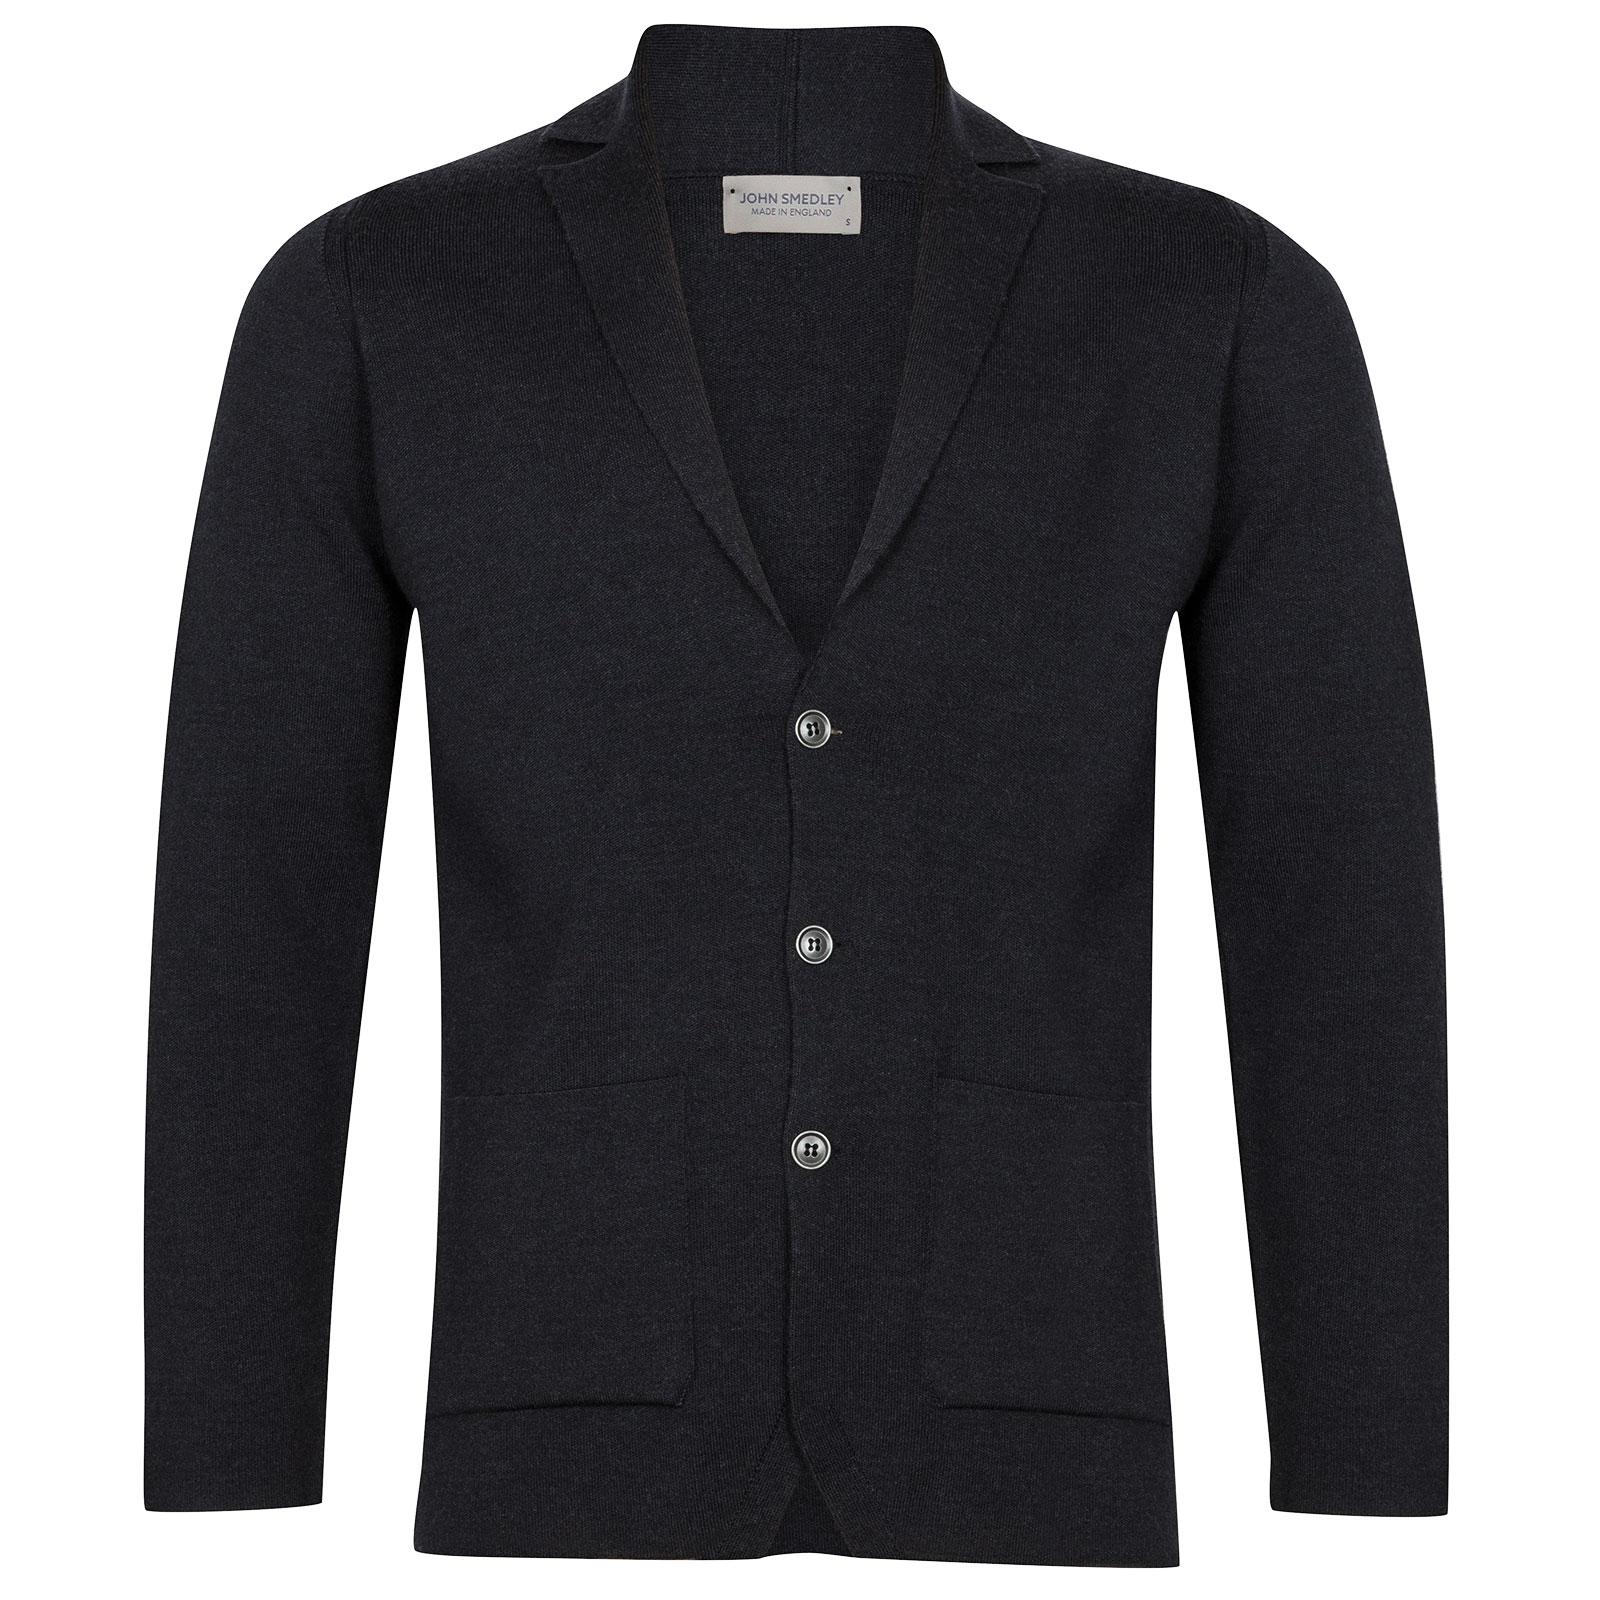 John Smedley Oxland Merino Wool Jacket in Hepburn Smoke-XXL